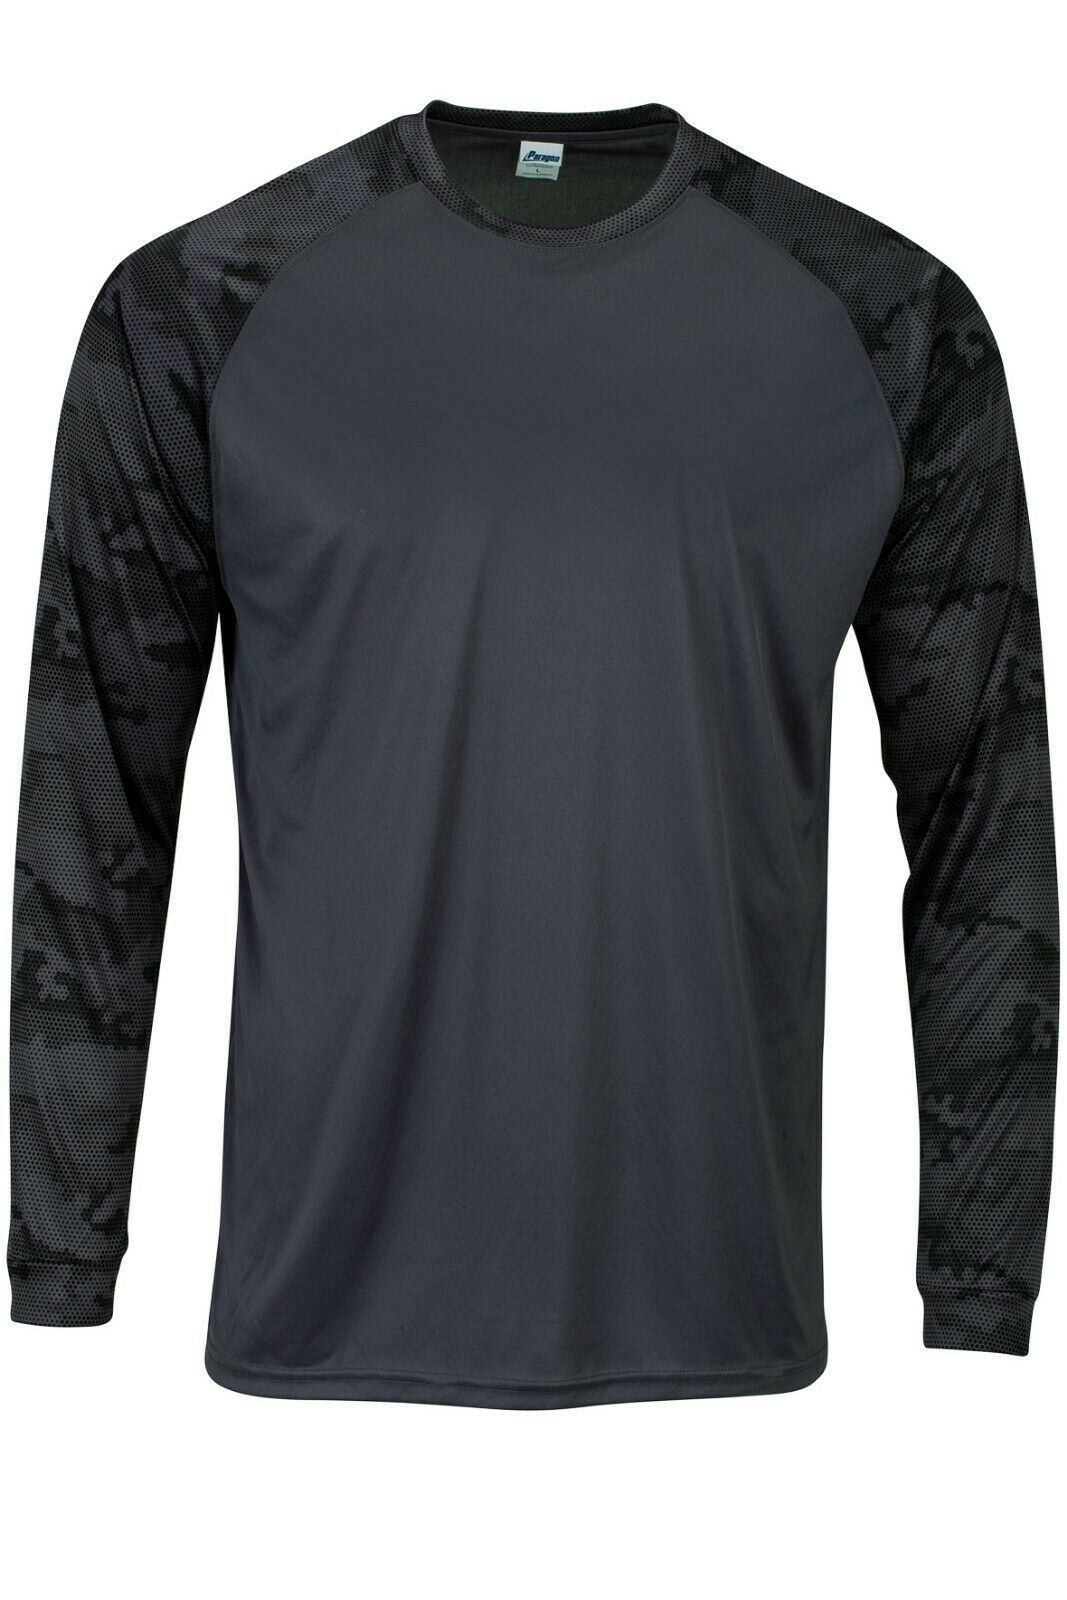 Sun Protection Long Sleeve Dri Fit Graphite Gray sun shirt Camo Sleeve SPF 50+